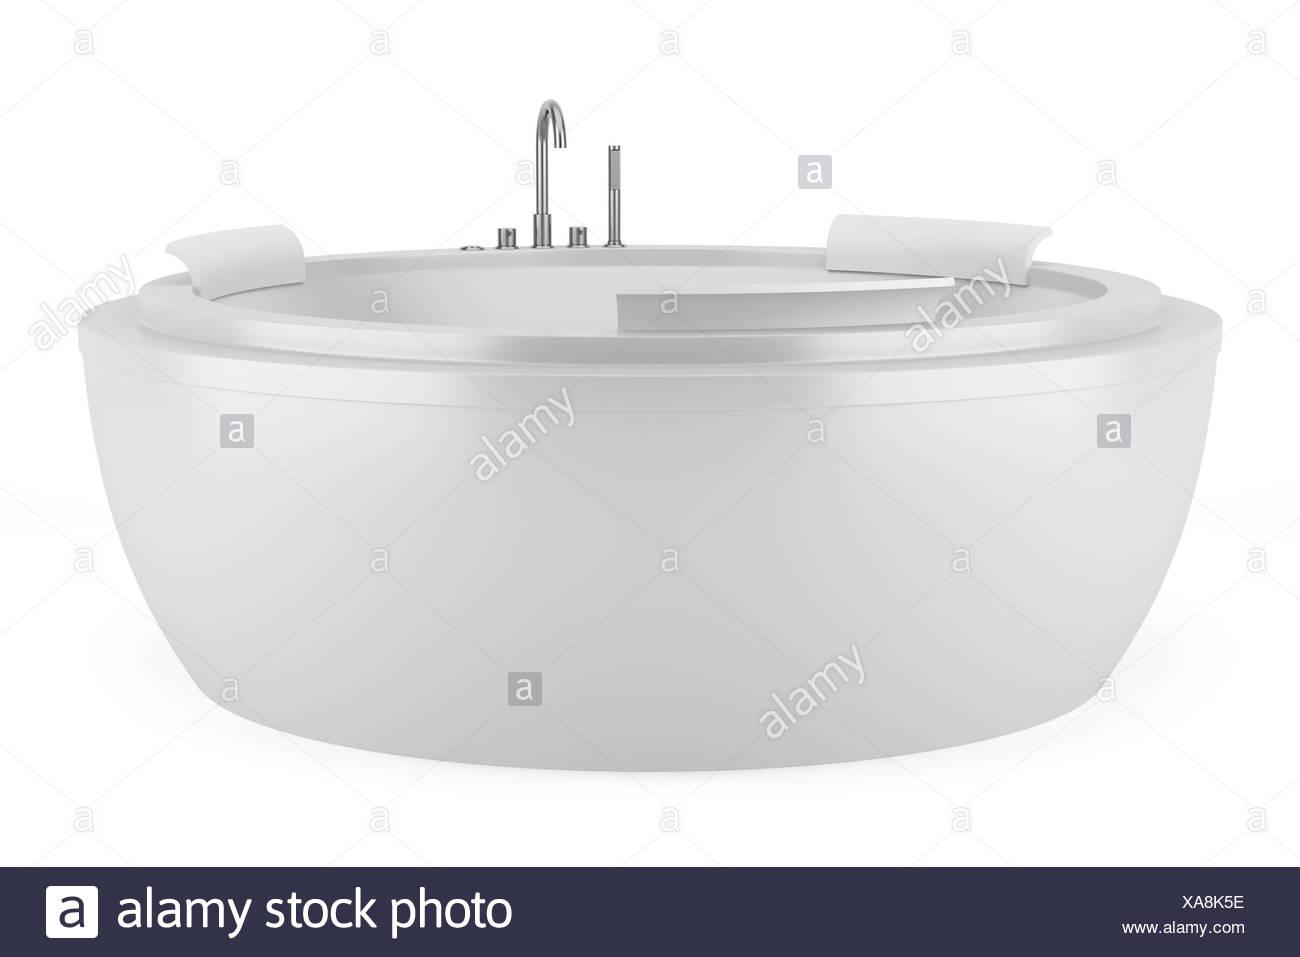 Vasca Da Bagno Rotonda : Vasca da bagno rotonda immagini vasca da bagno rotonda fotos